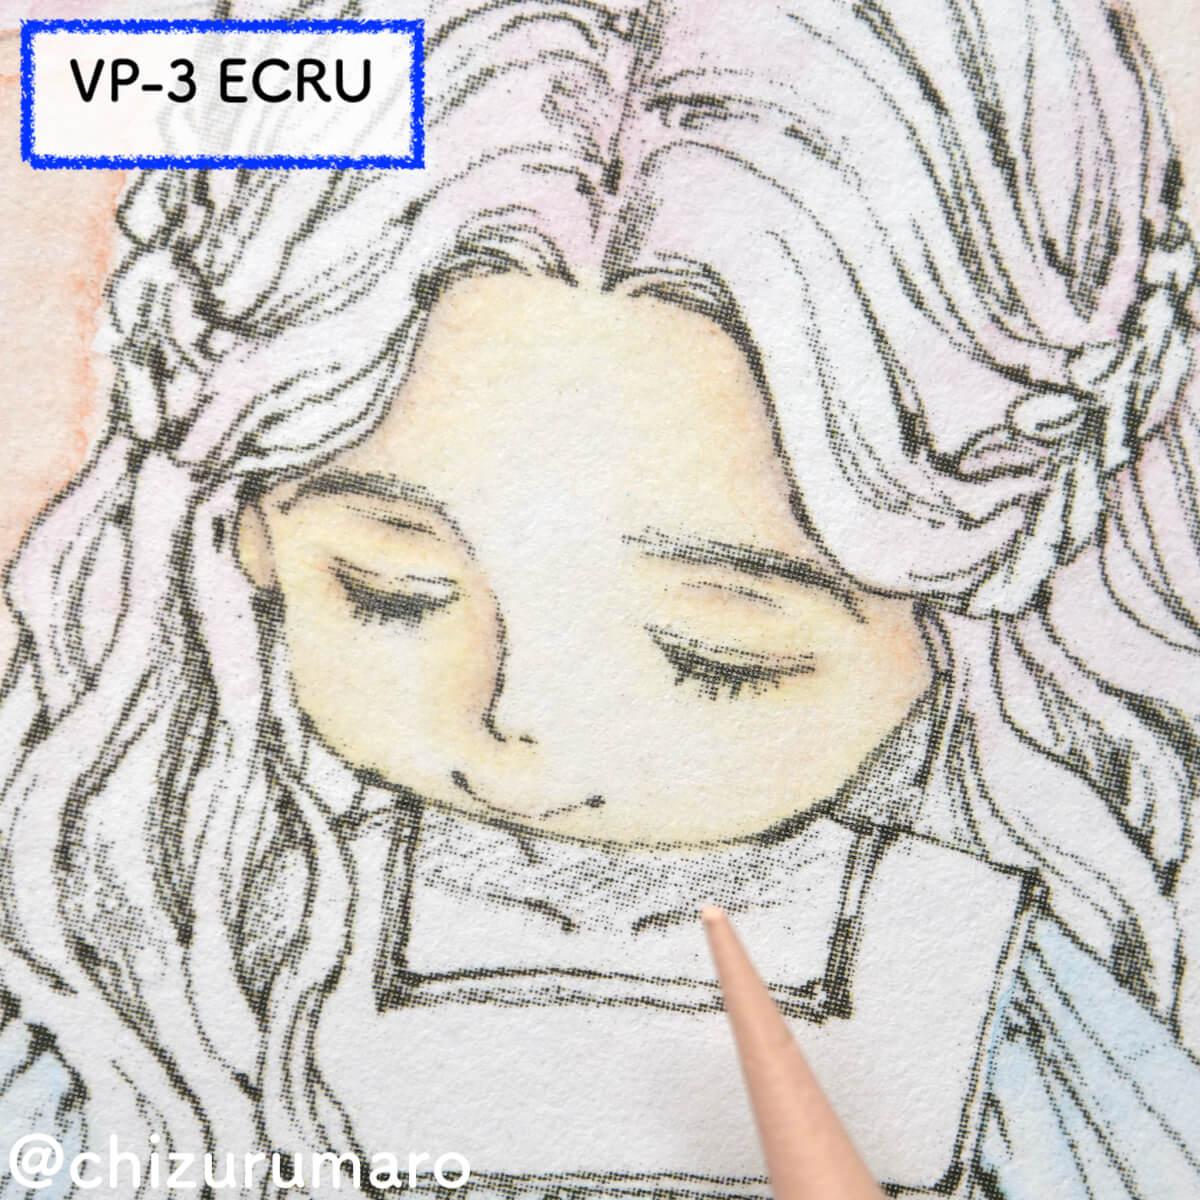 f:id:chizurumaro:20210616164848j:plain